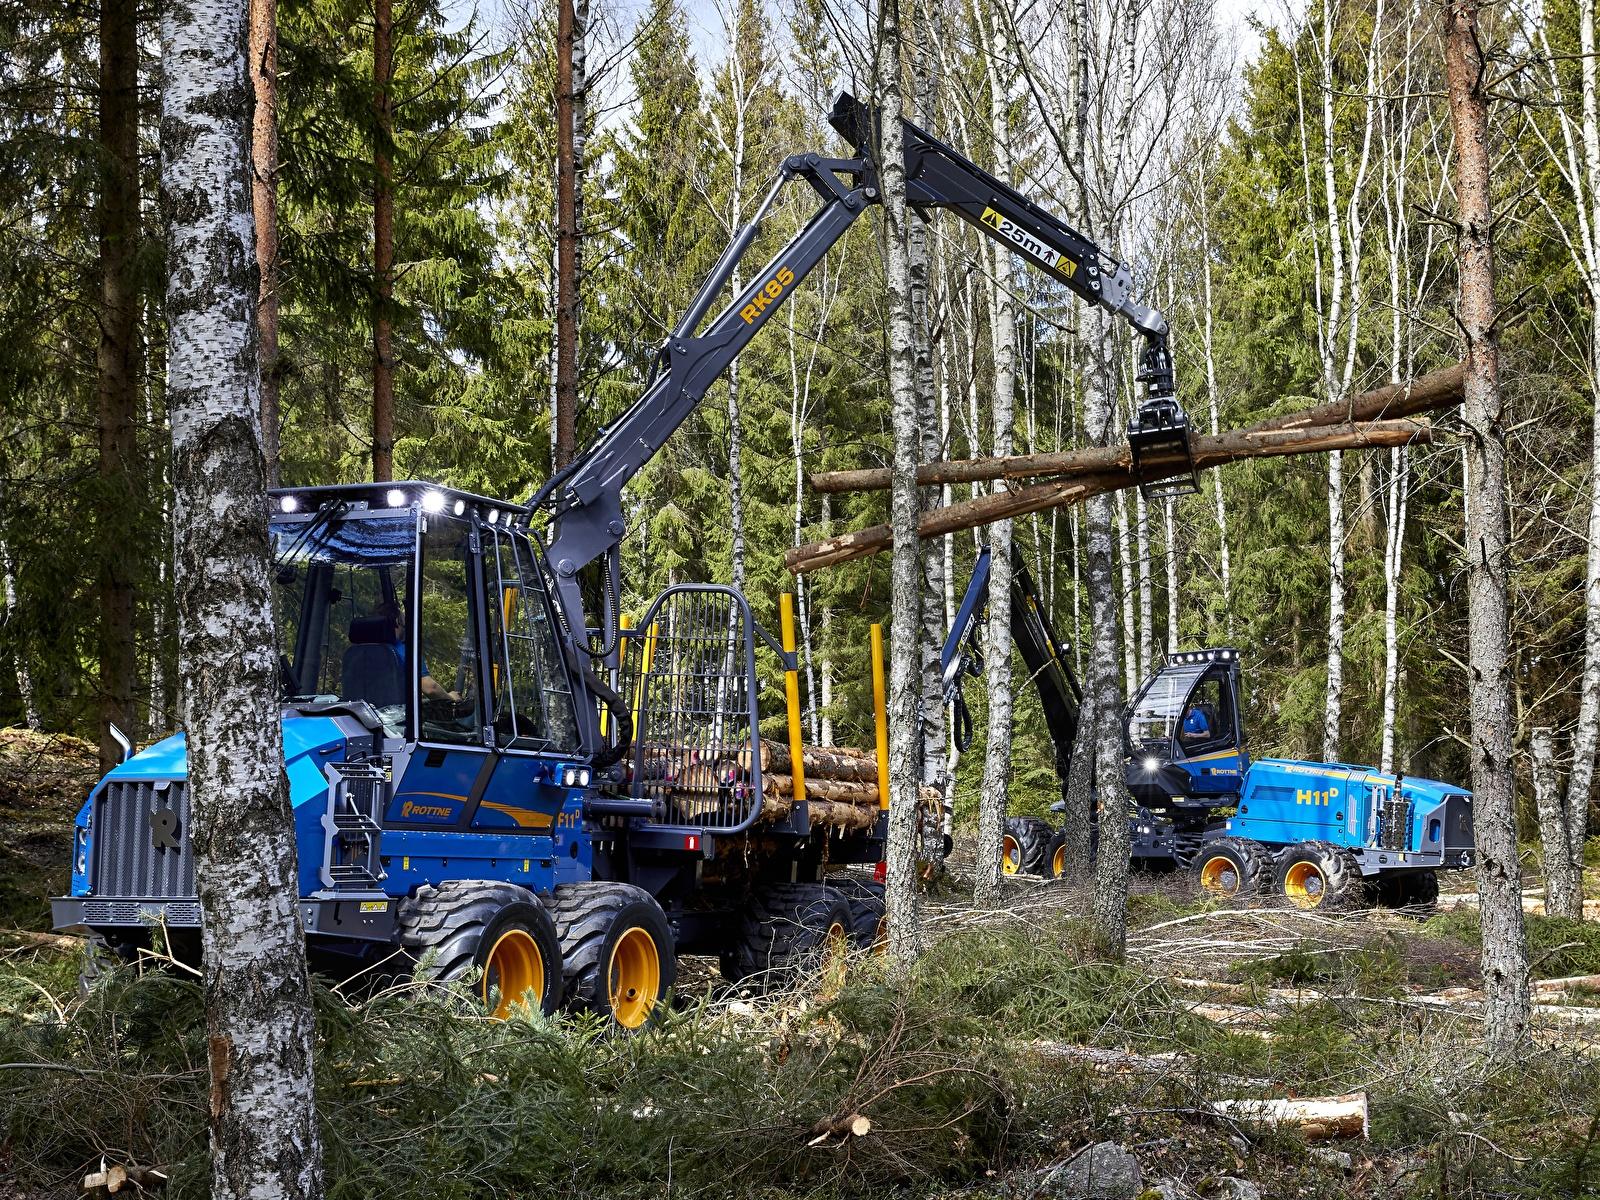 Обои для рабочего стола Форвардер Rottne F11D, Rottne H11D 8WD Леса 1600x1200 лес